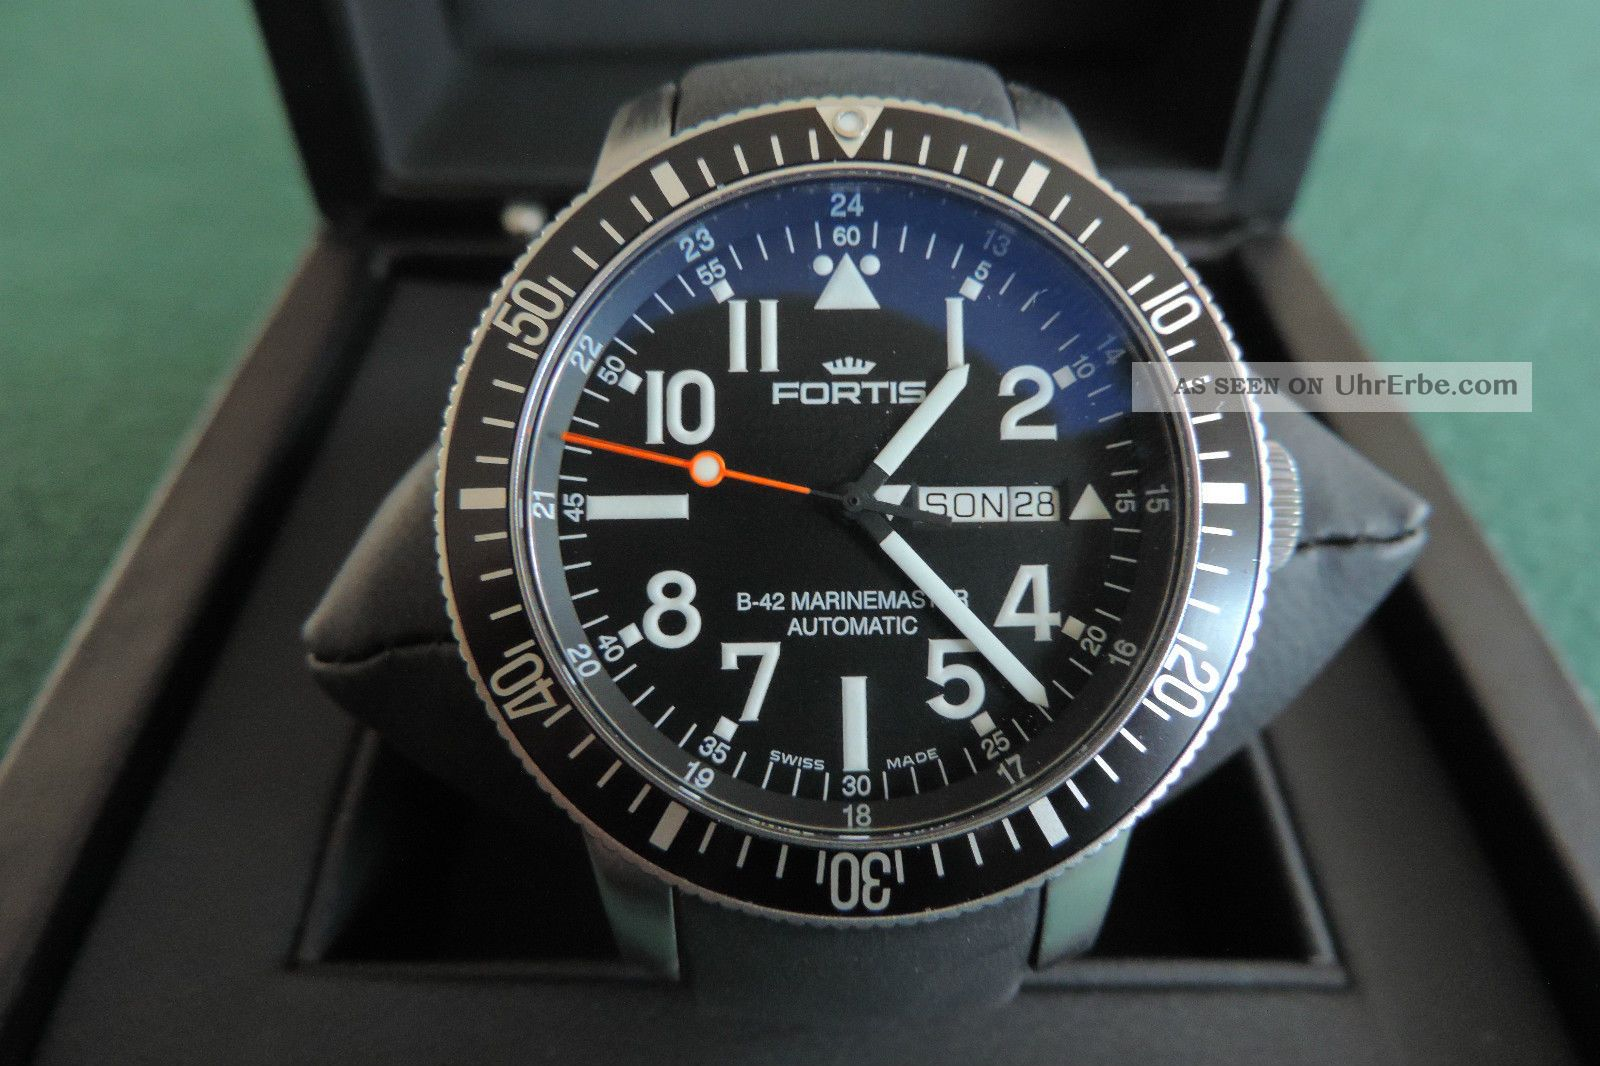 Fortis B42 Marinemaster Armbanduhren Bild